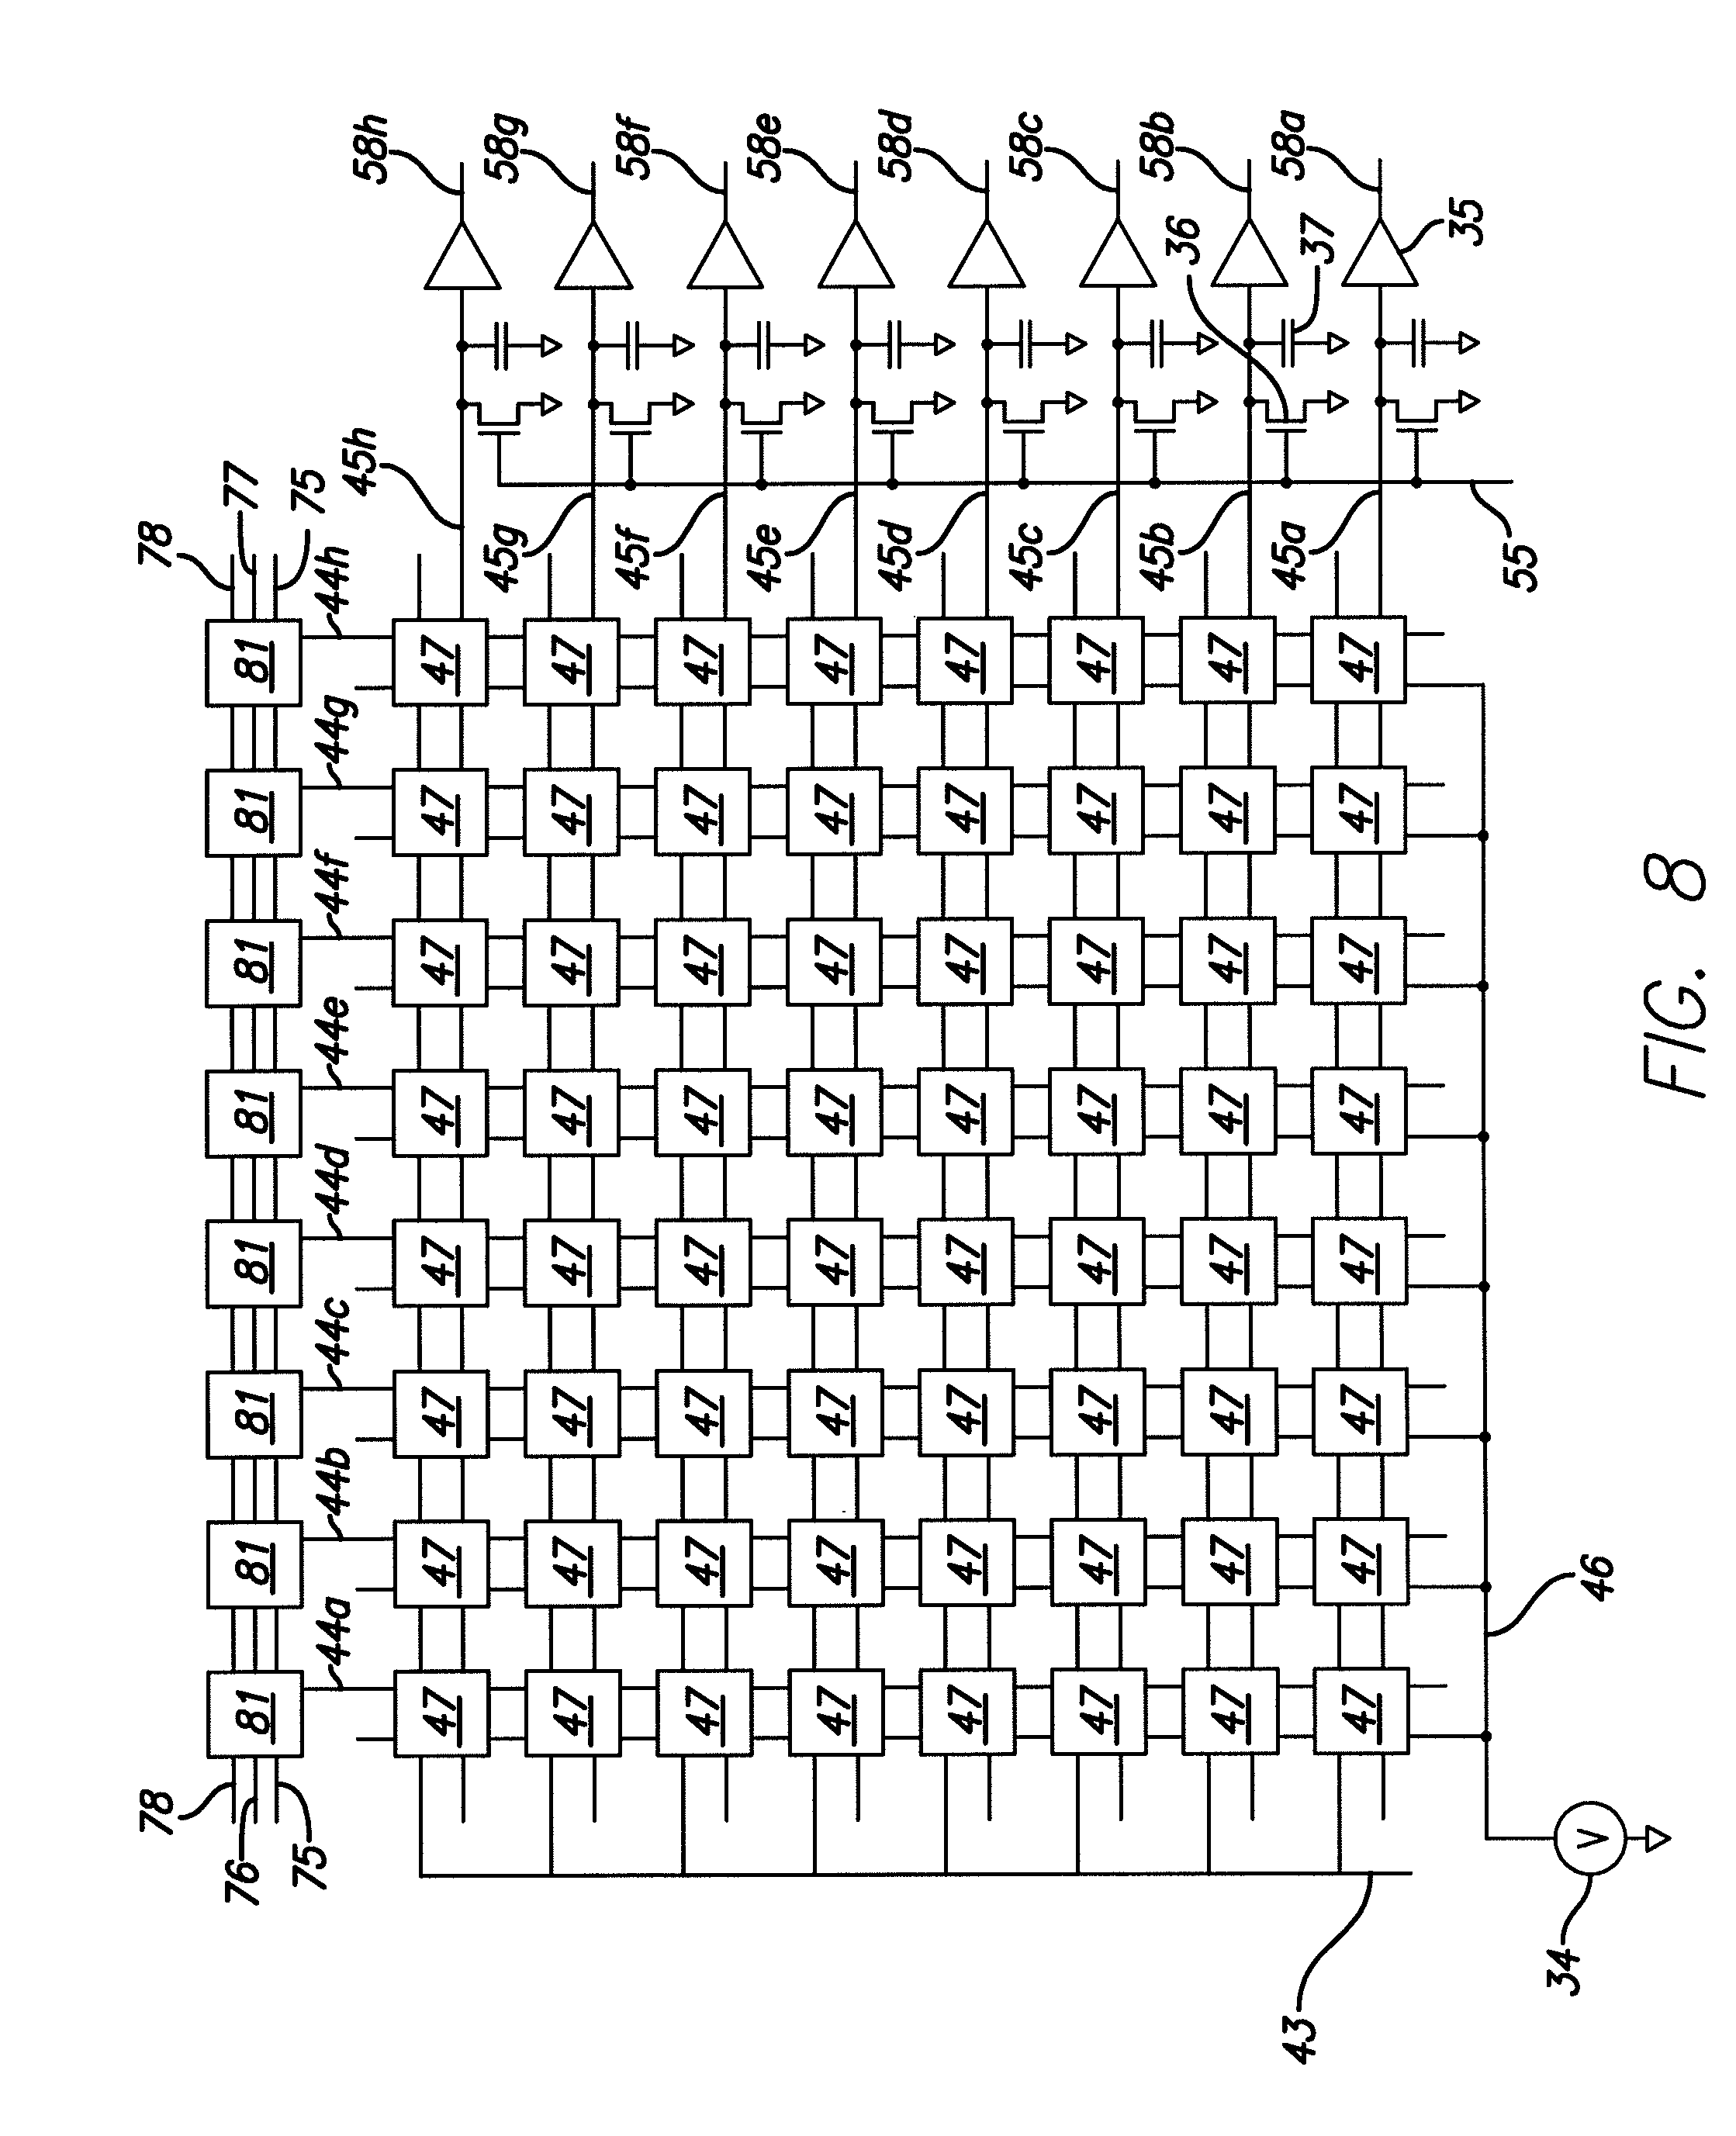 Patent Us 9804701 B2 Paragon Alarm Wiring Diagram